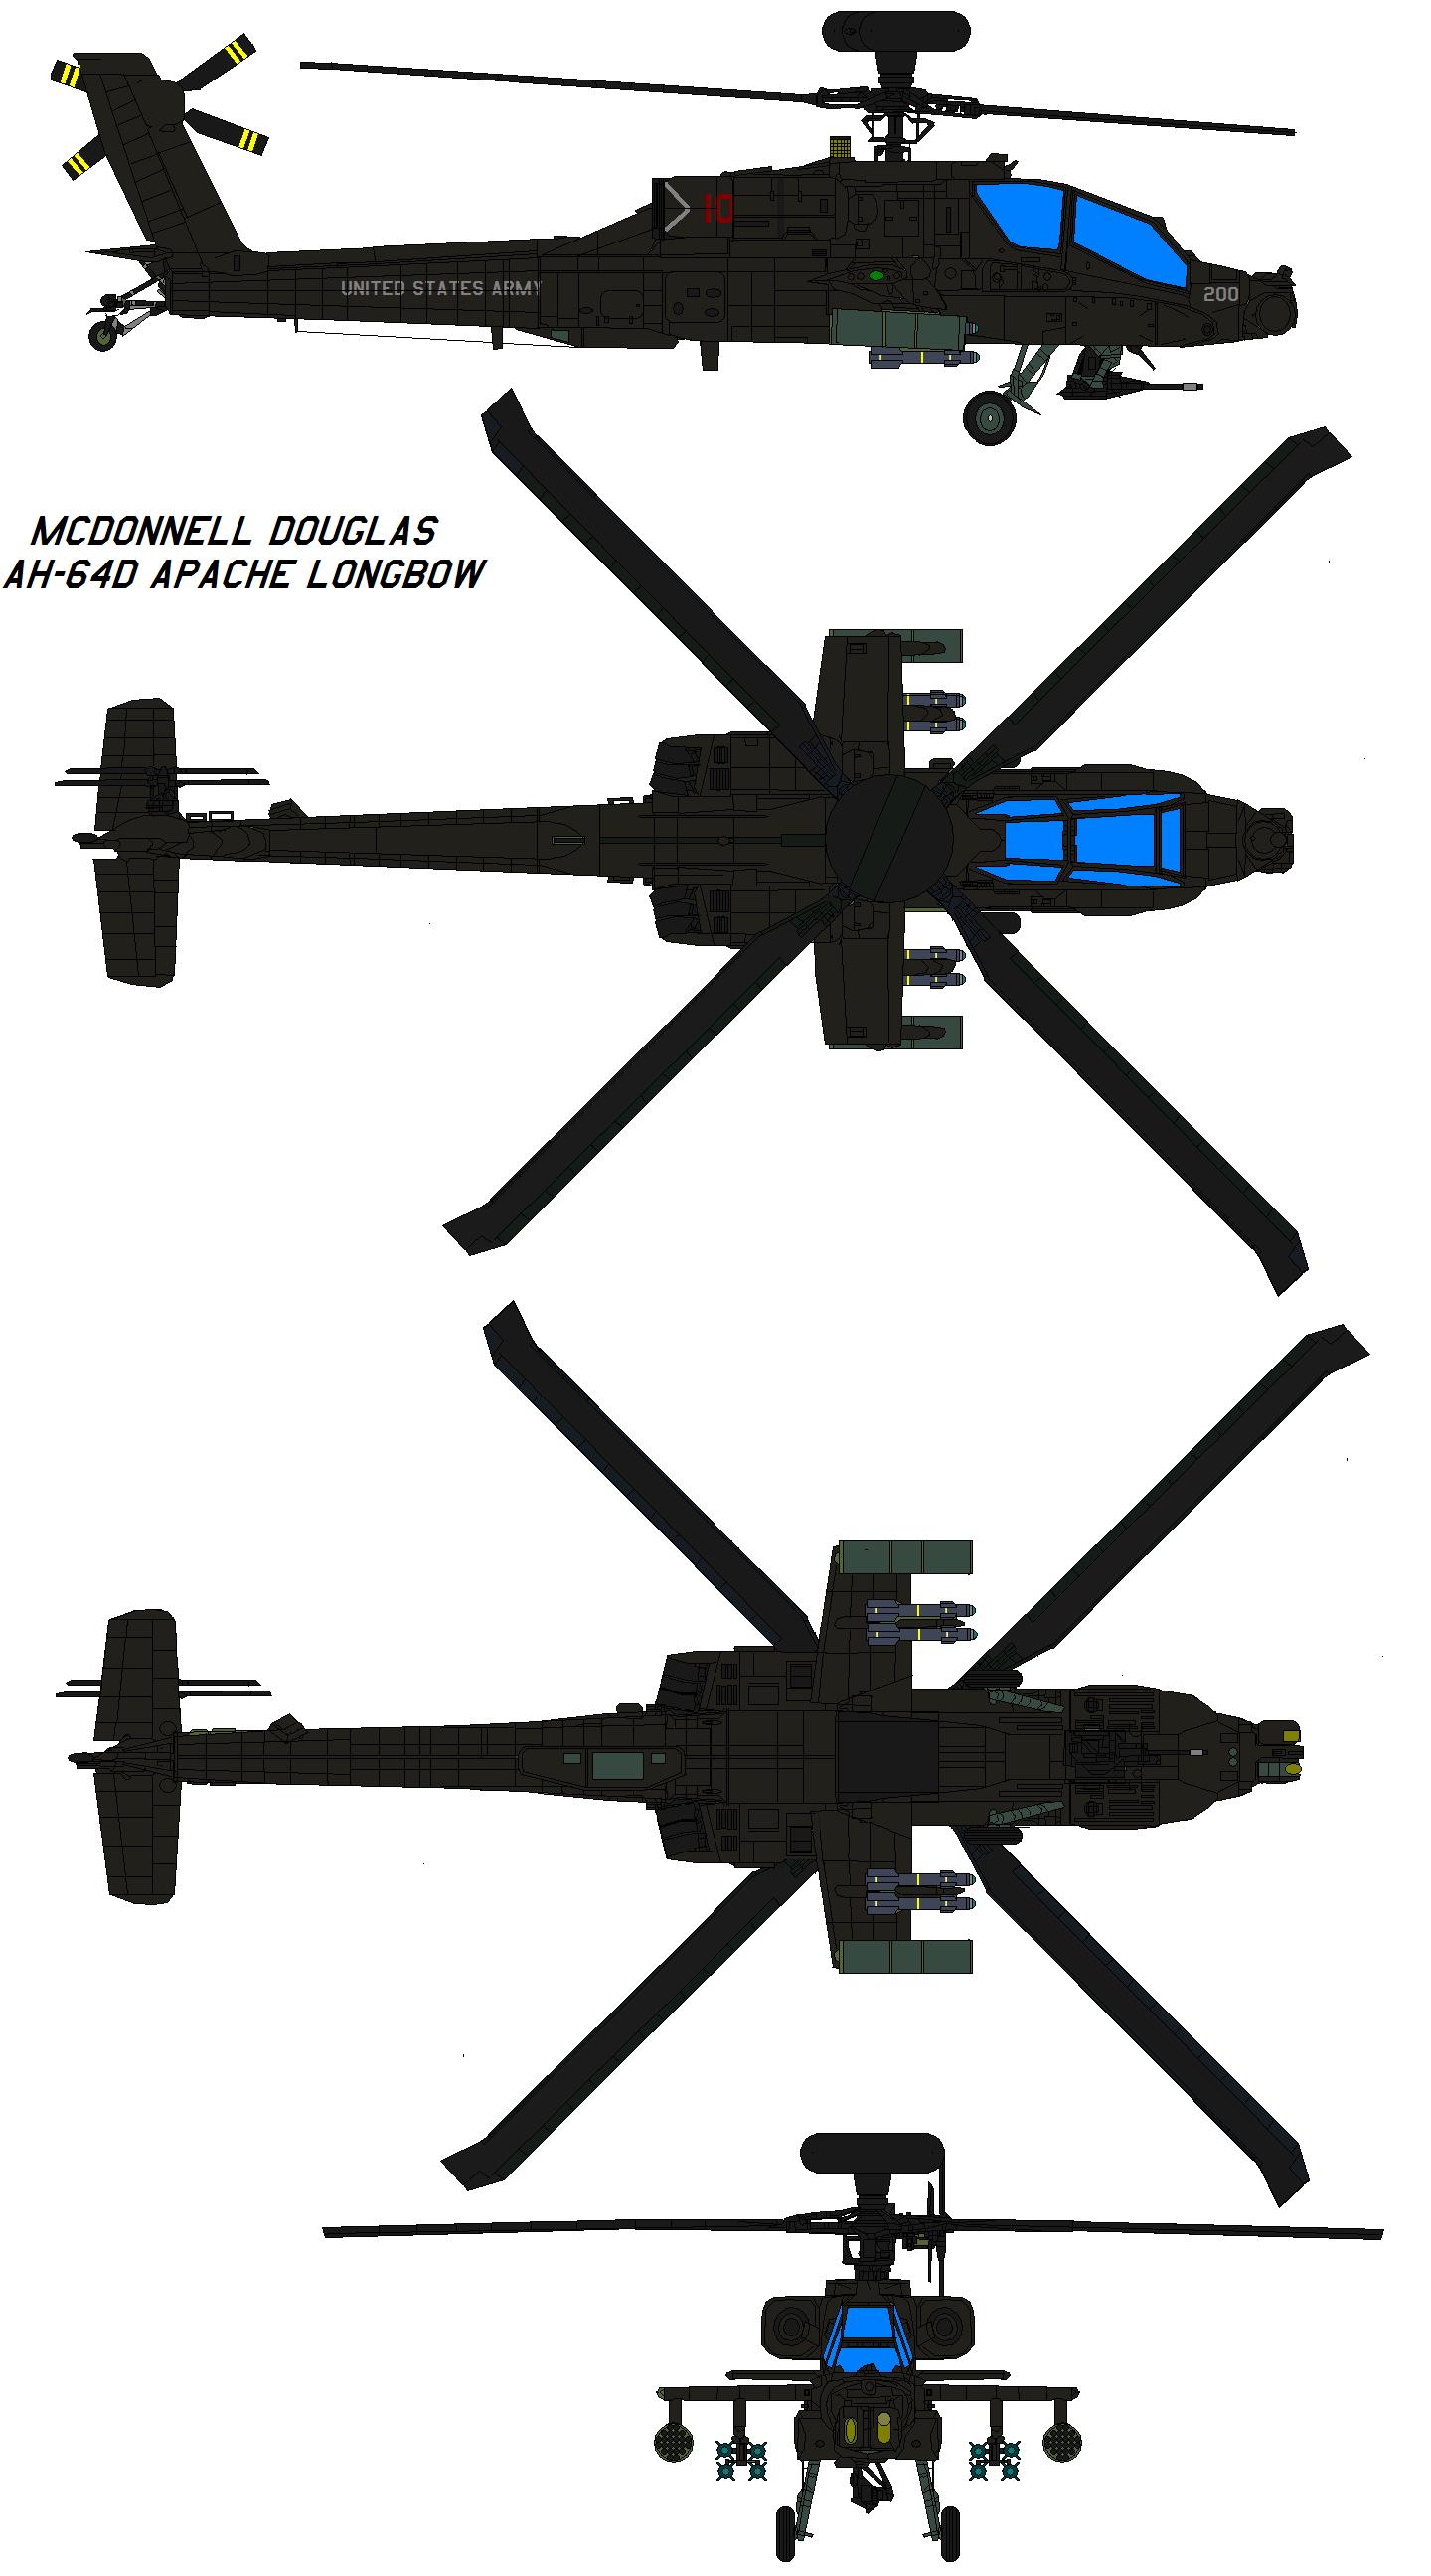 Ah 64d Apache Longbow Ah 64d Military Helicopter Aircraft Maintenance